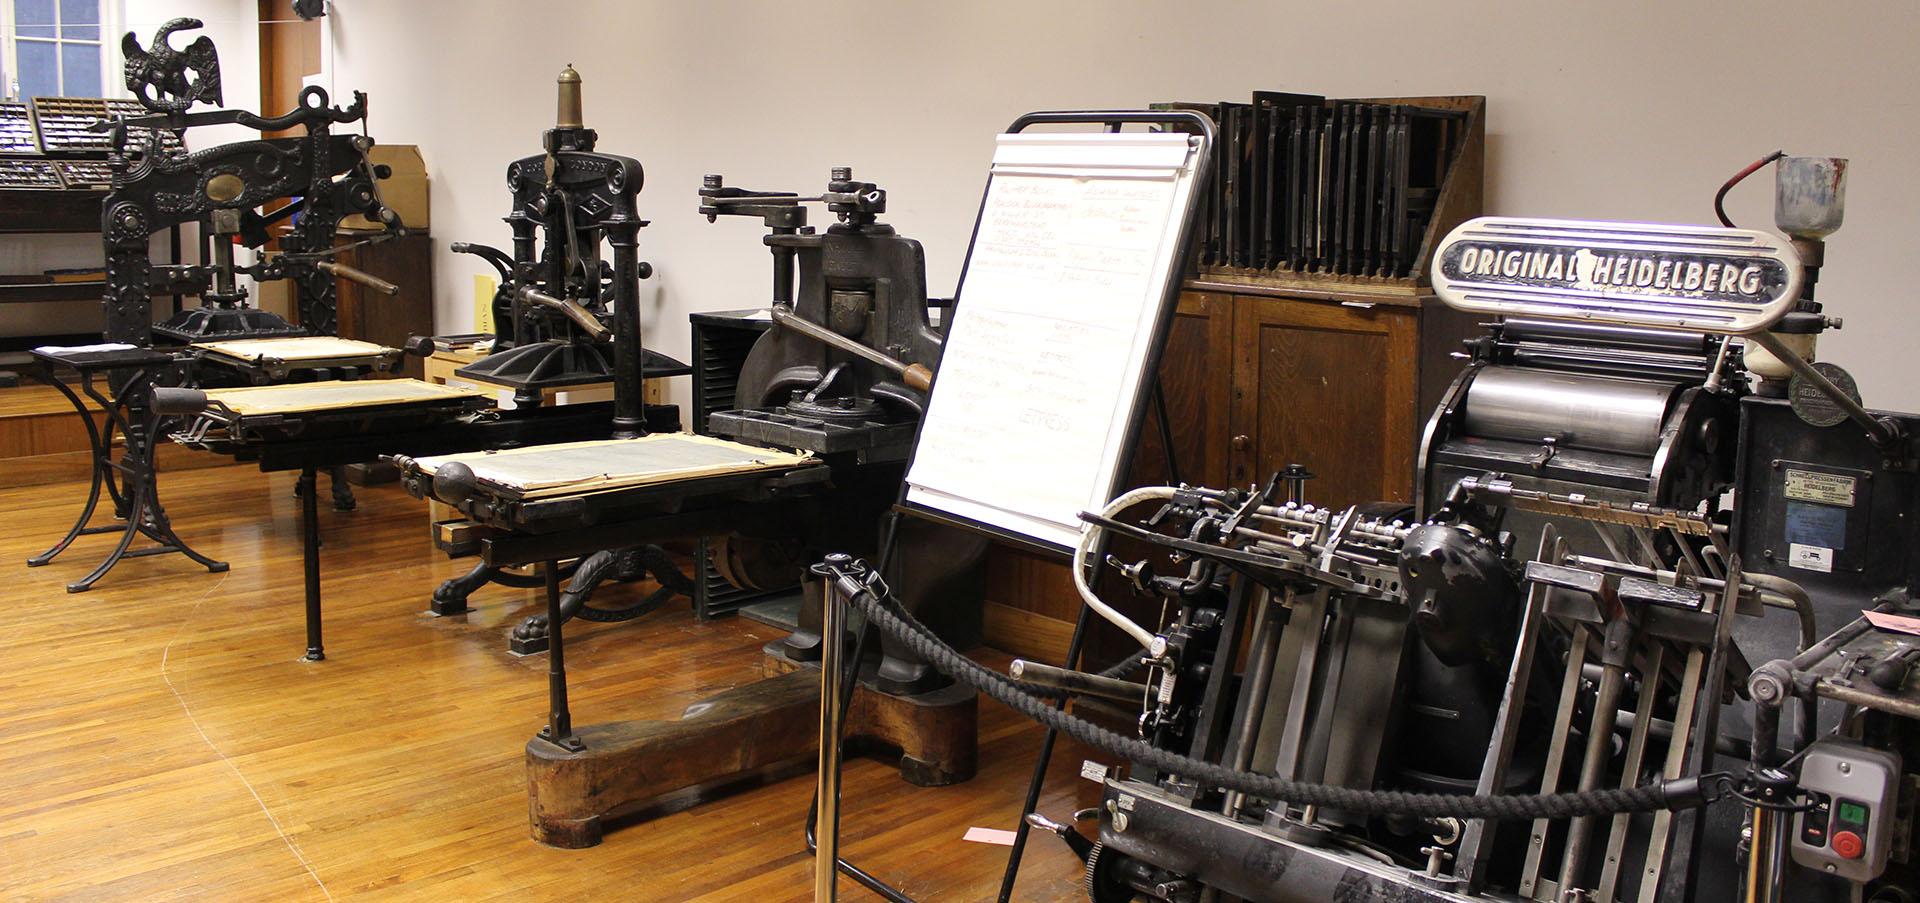 St Bride's Printing Machines